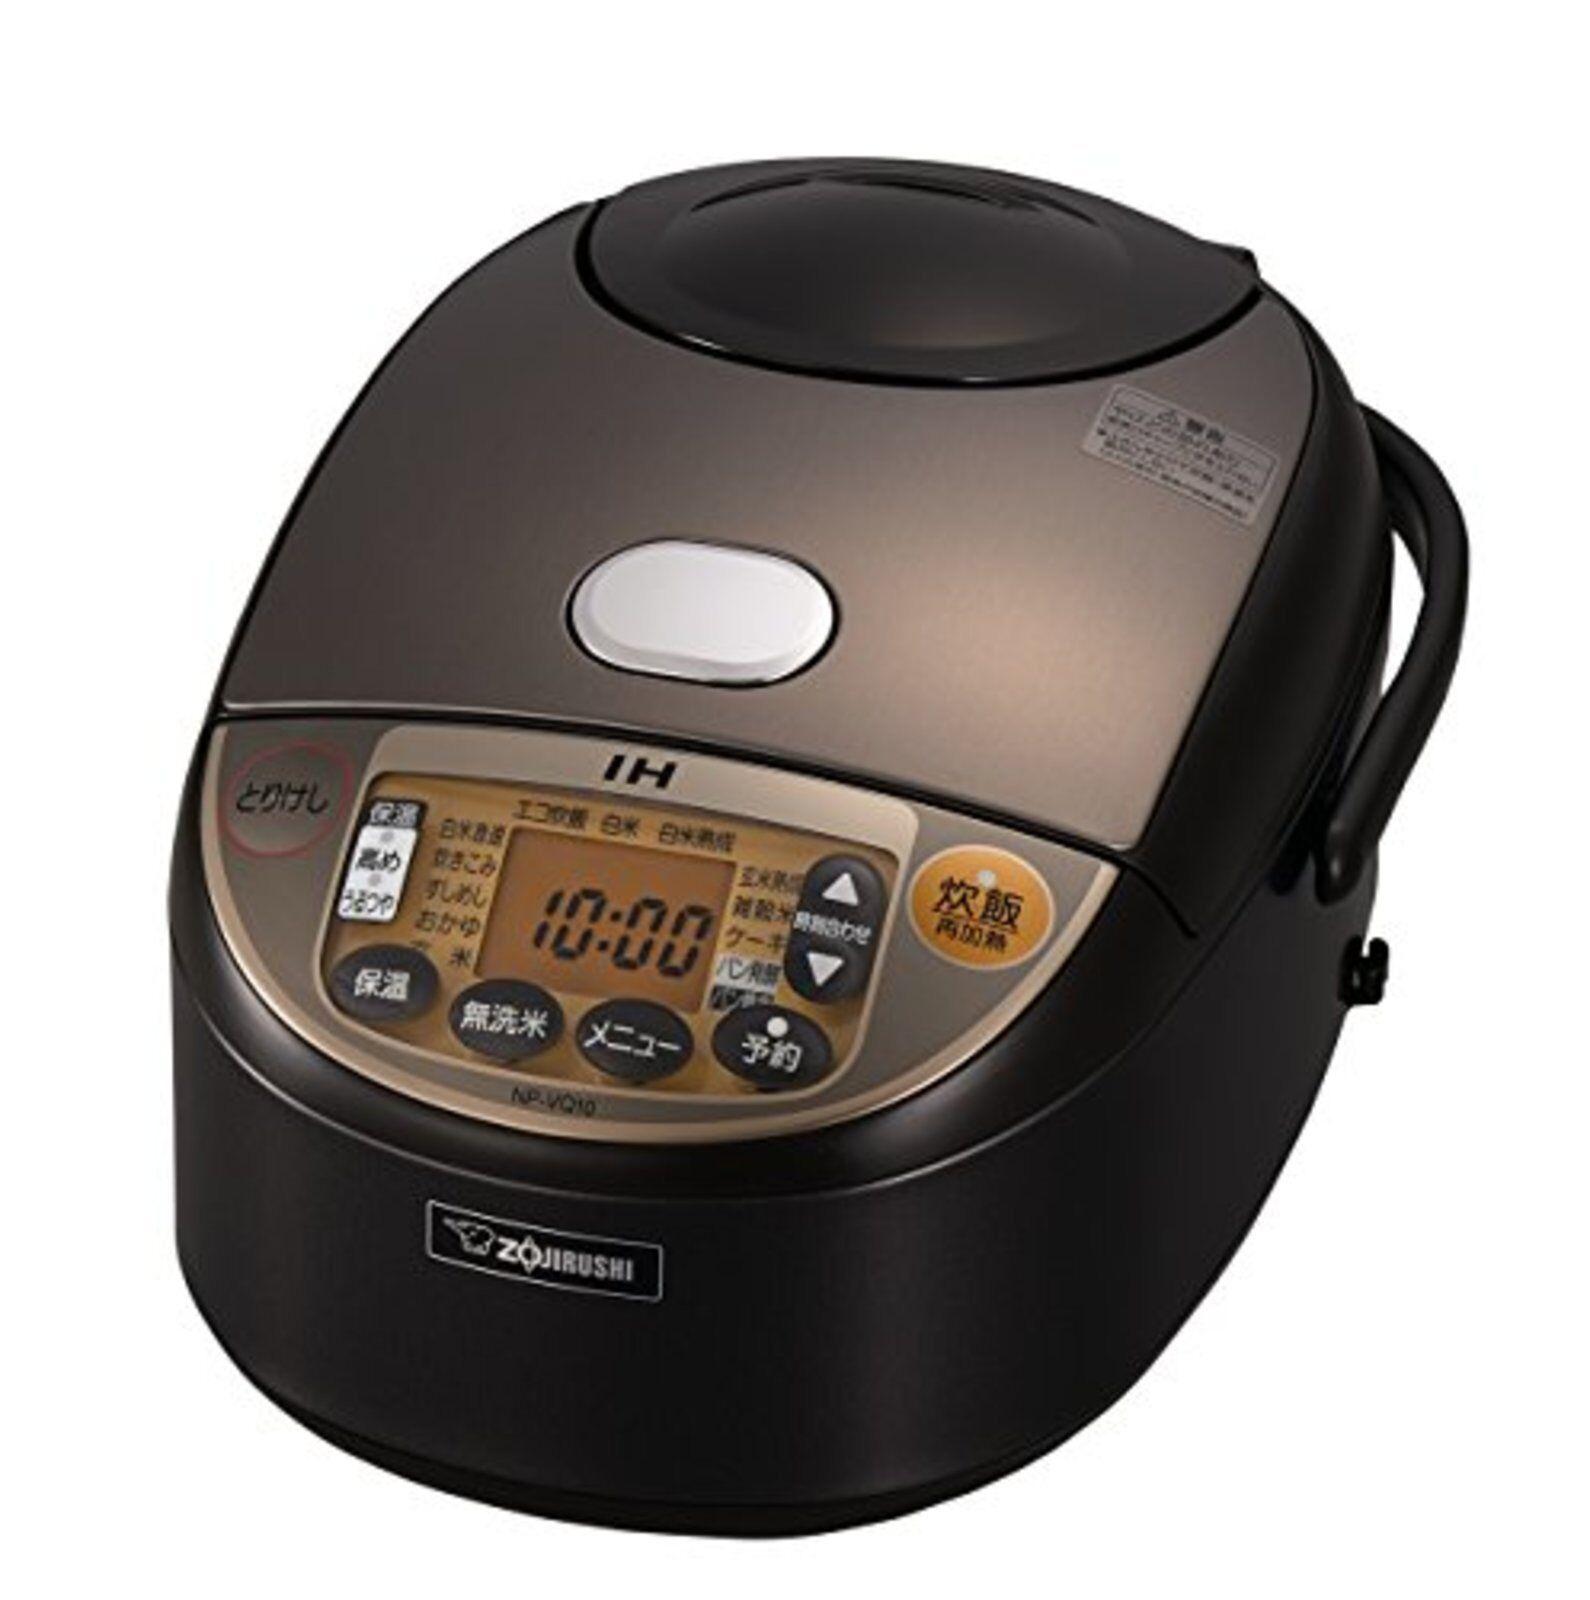 Zojirushi IH Cuiseur à riz 5.5 Go Cook marron Zojirushi extrêmement Cook NP-VQ10-TA